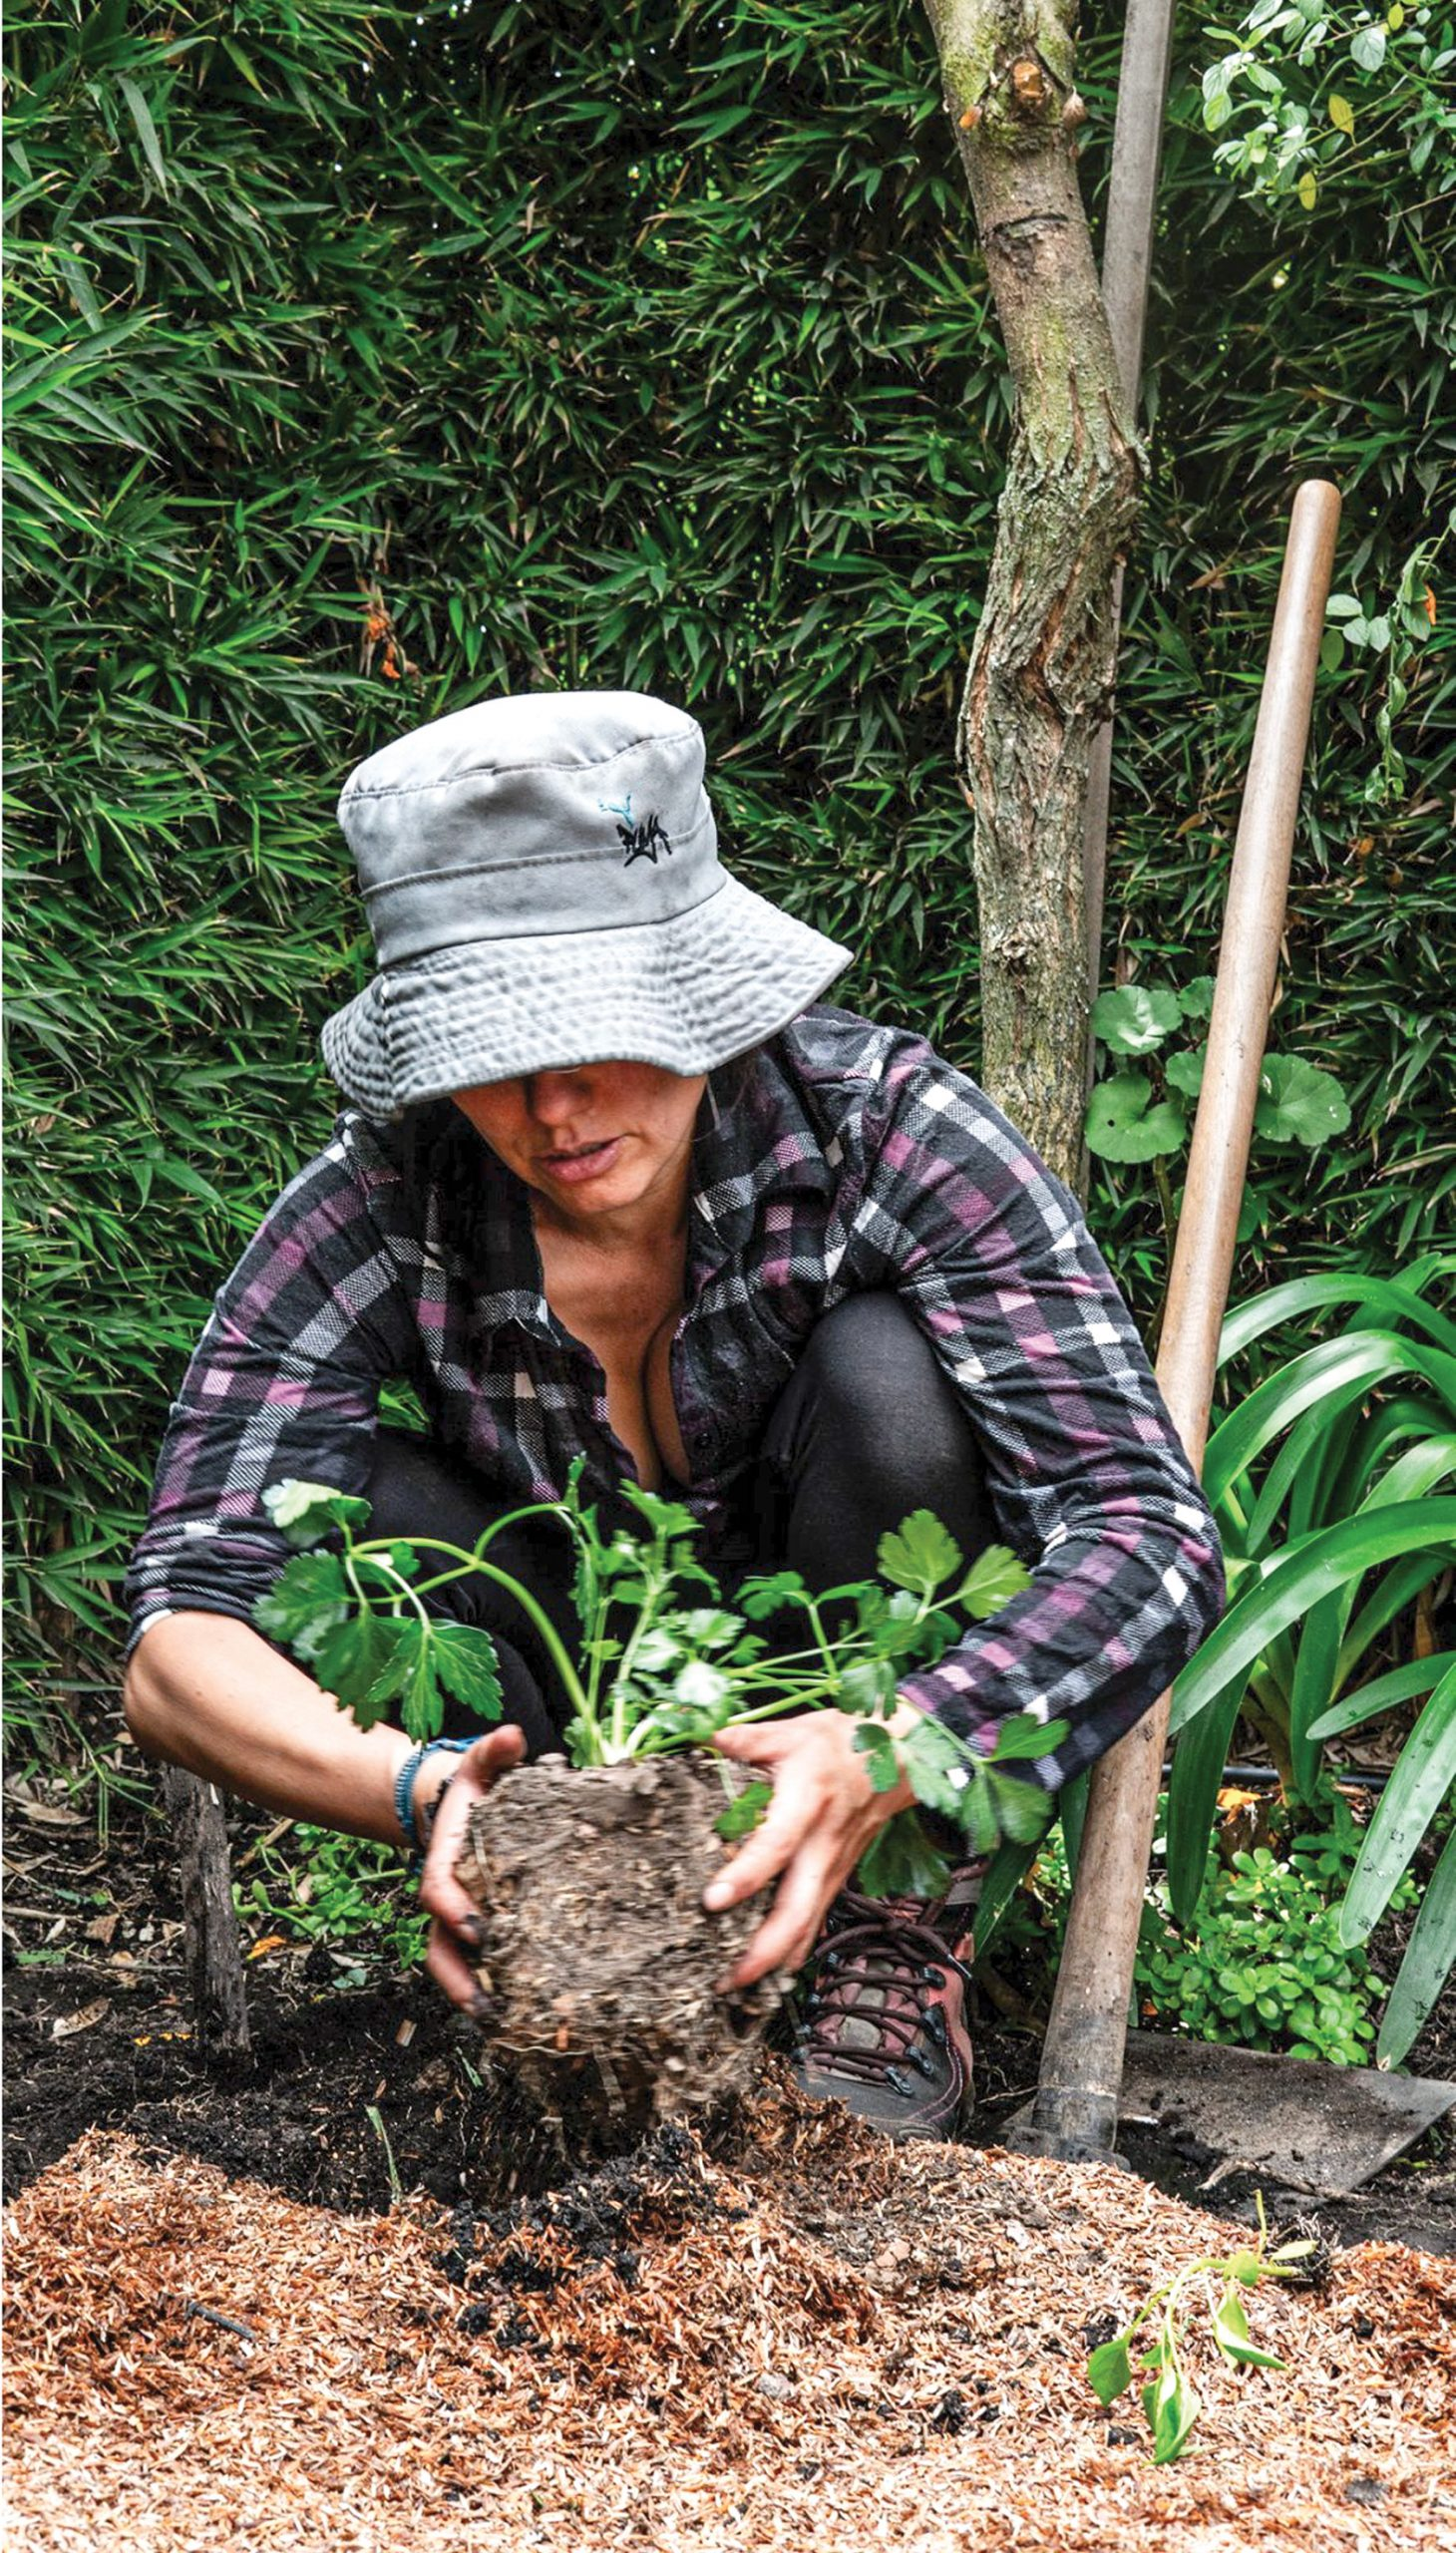 Huertos agroecológicos para comer sano